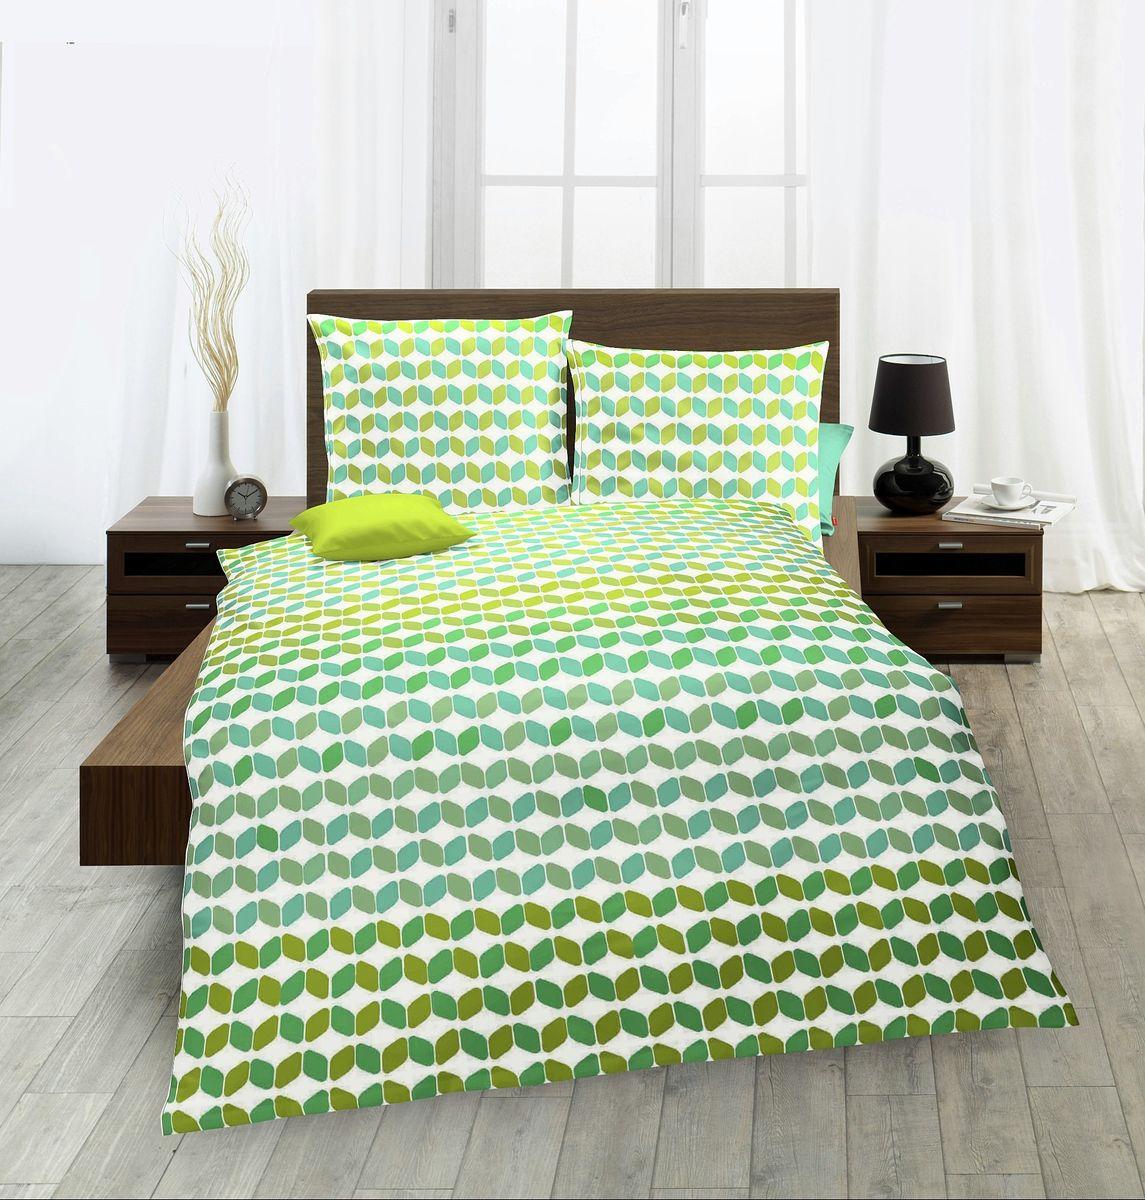 fleuresse seersucker bettw sche farbenspiel bunt gr n bettw sche bettw sche 240x220cm. Black Bedroom Furniture Sets. Home Design Ideas